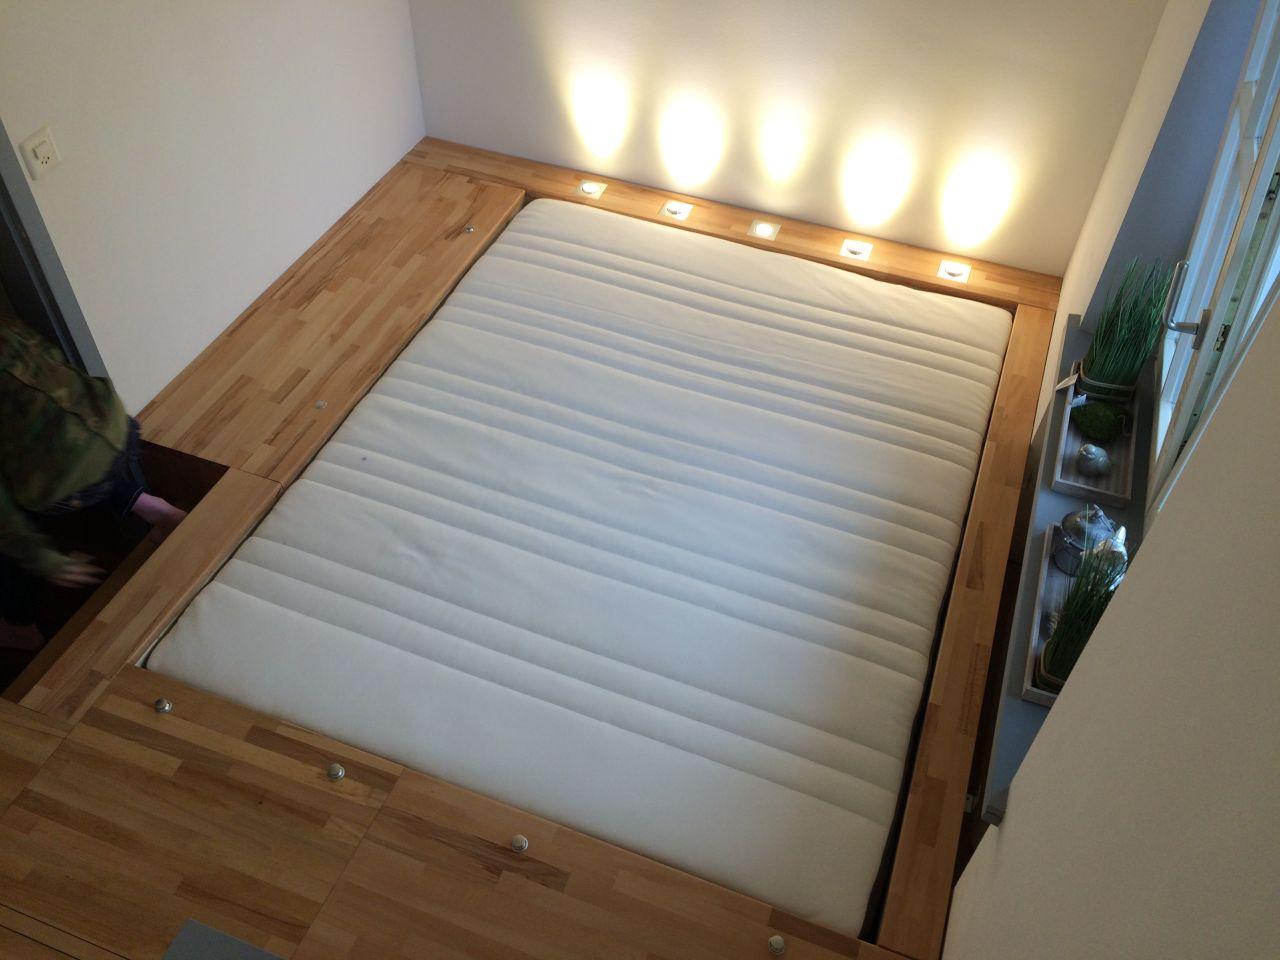 Full Size of Podest Bett Podestbett Ikea Selber Bauen Kosten Darunter Podestbetten 140x200 Diy Betten Mit Stauraum Hack Kaufen Anleitung Das Schlafzimmer Hinter Der Bett Podest Bett